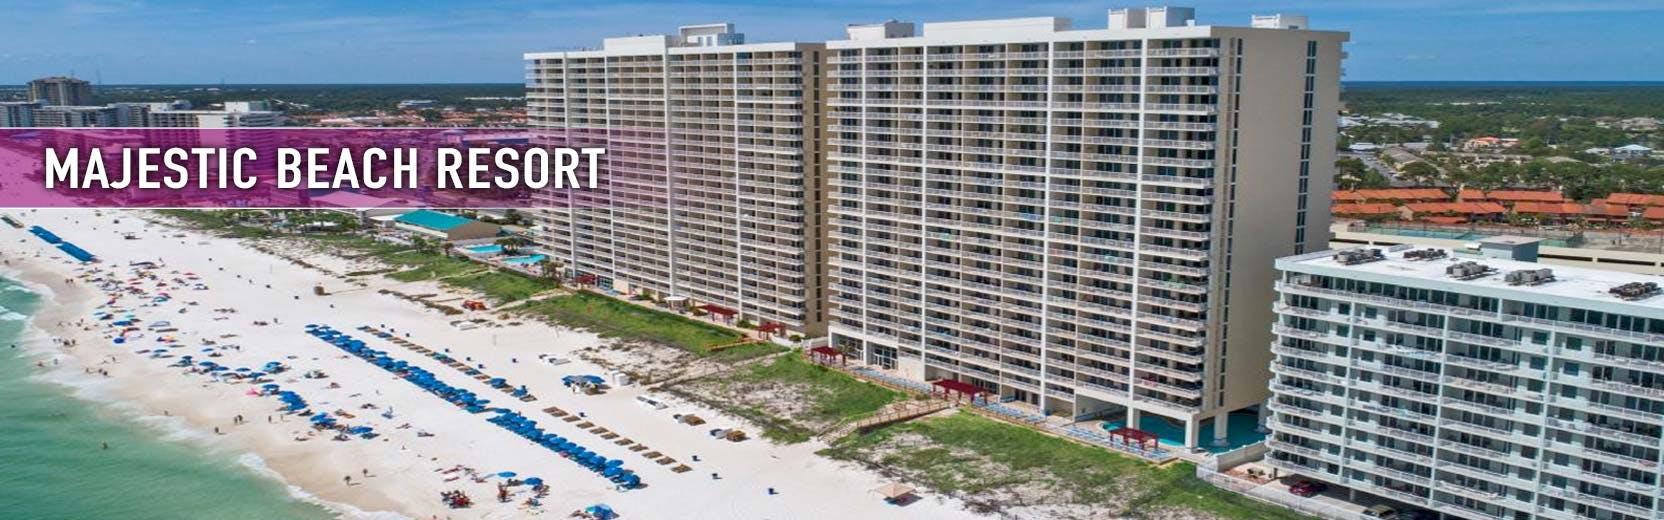 Majestic Beach Resort Panama City Fl Book Condo Als